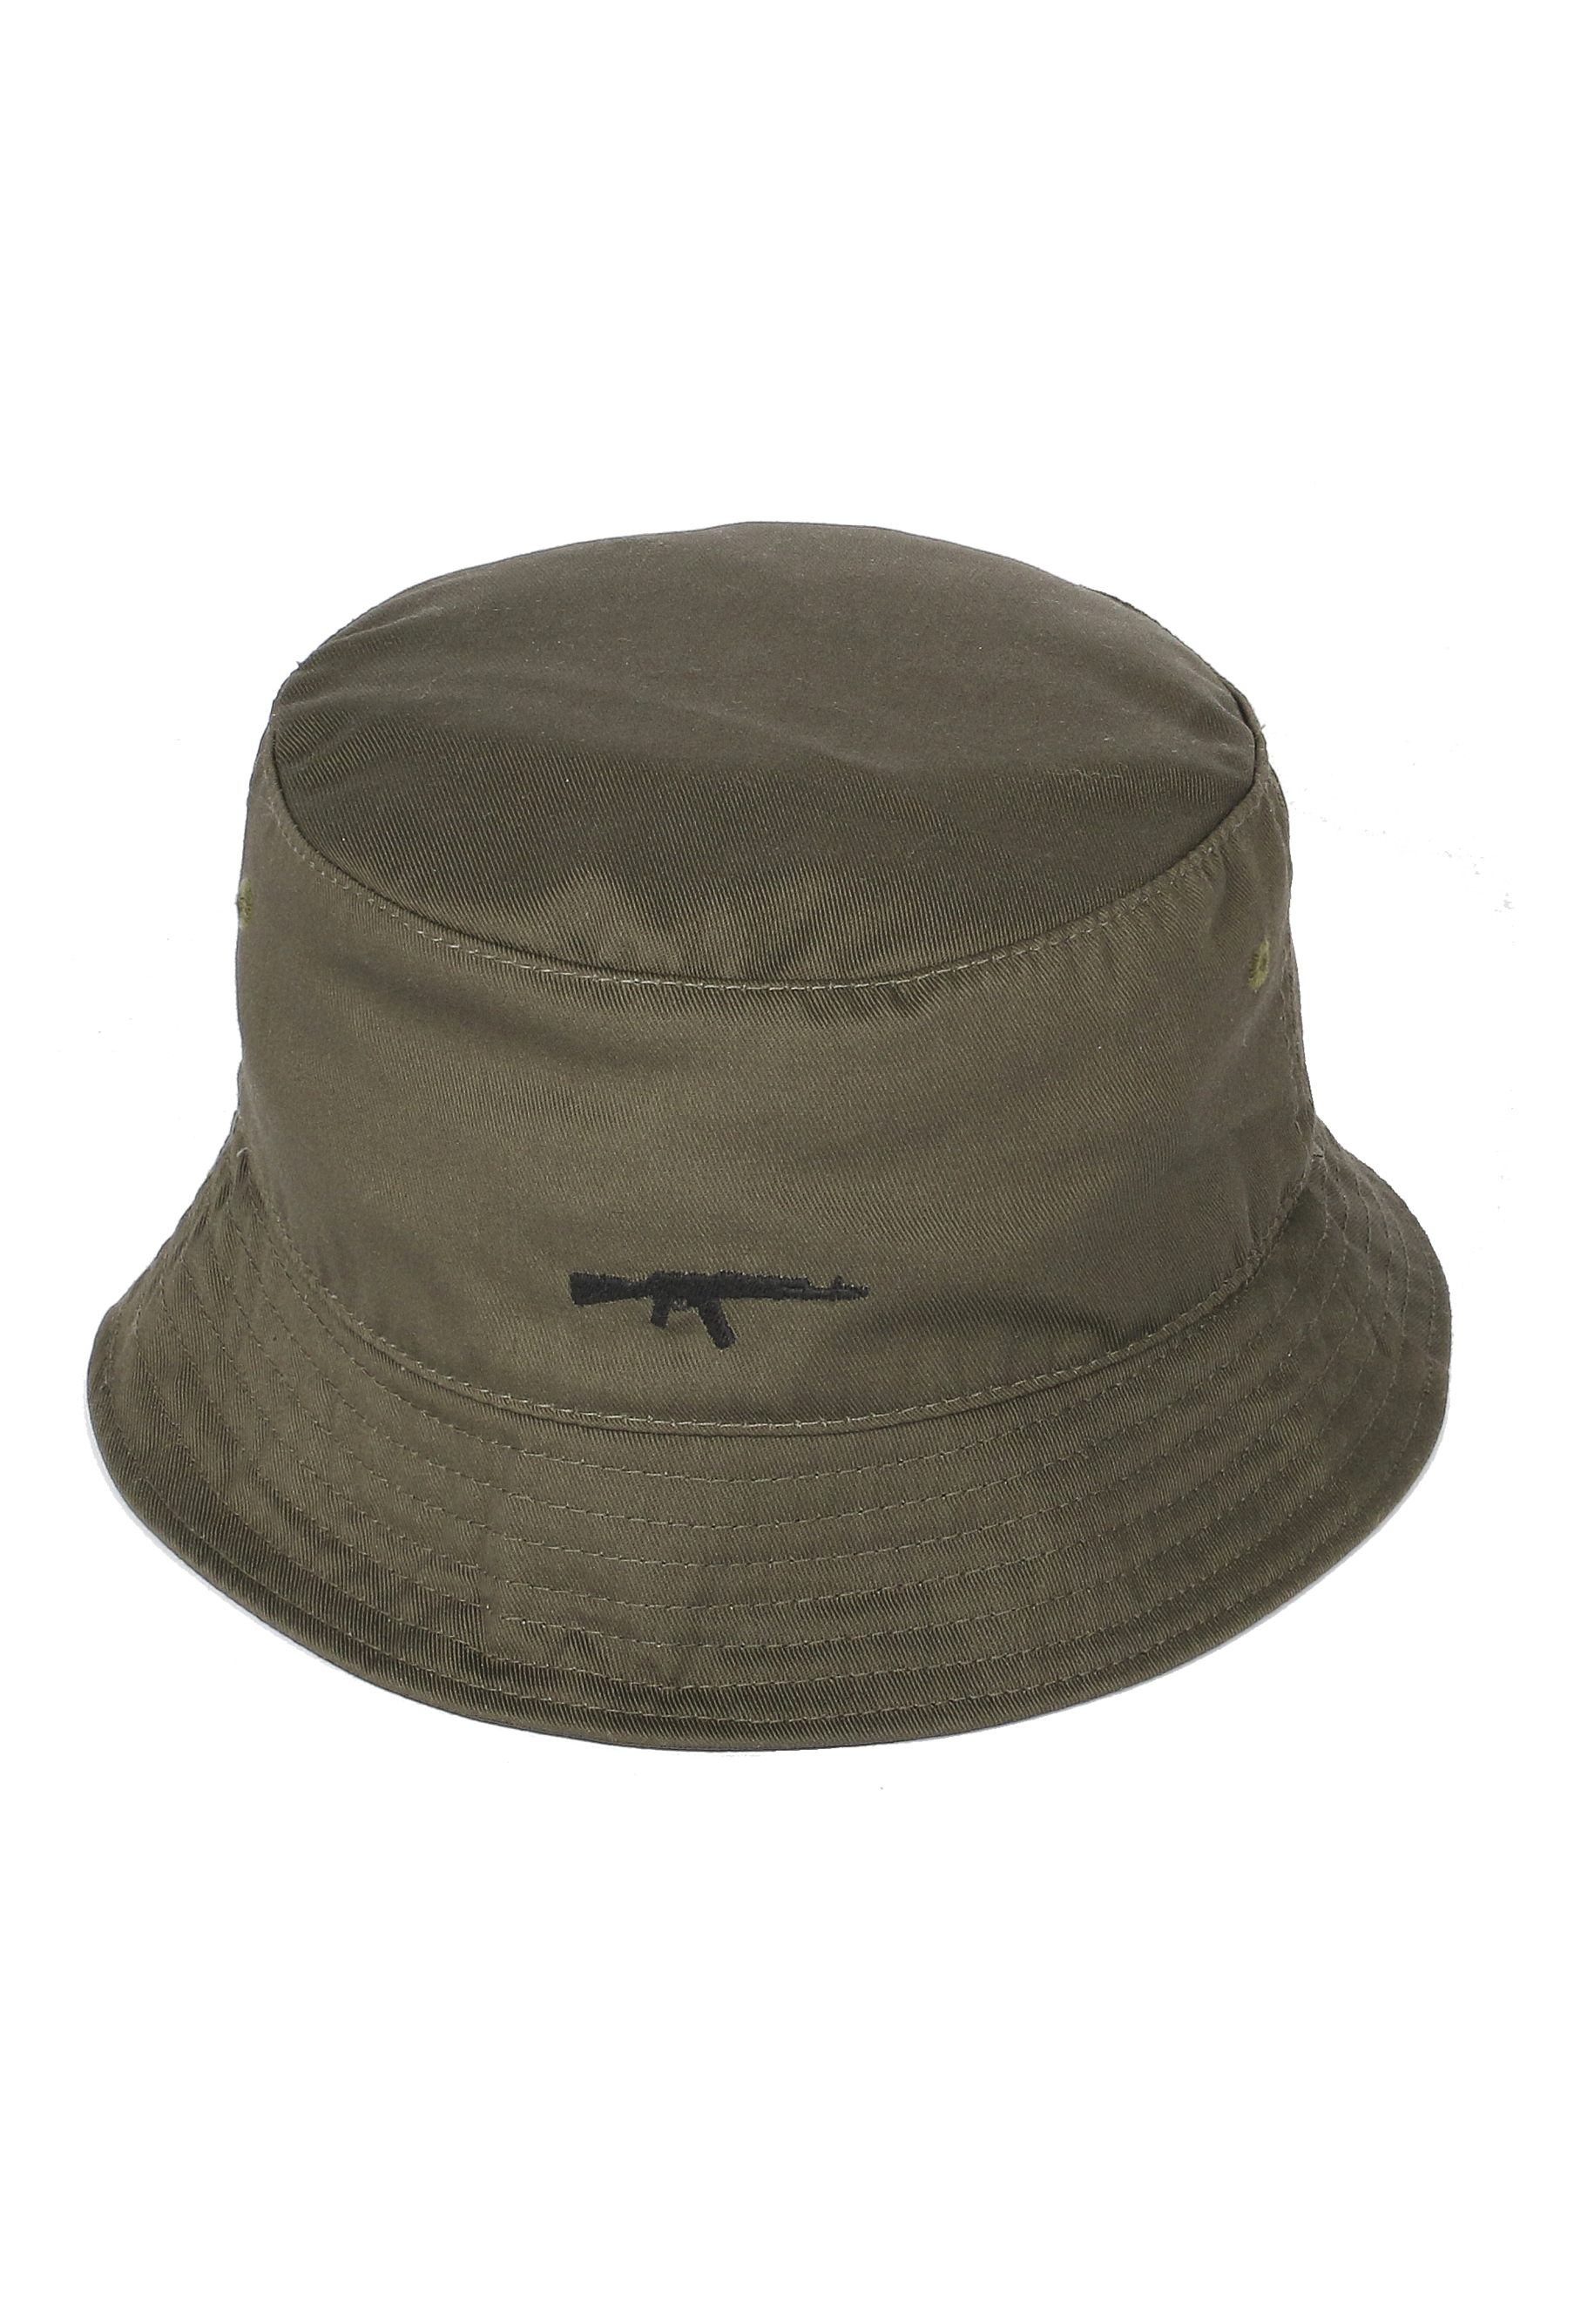 Panama hat unisex Black Star Rifle